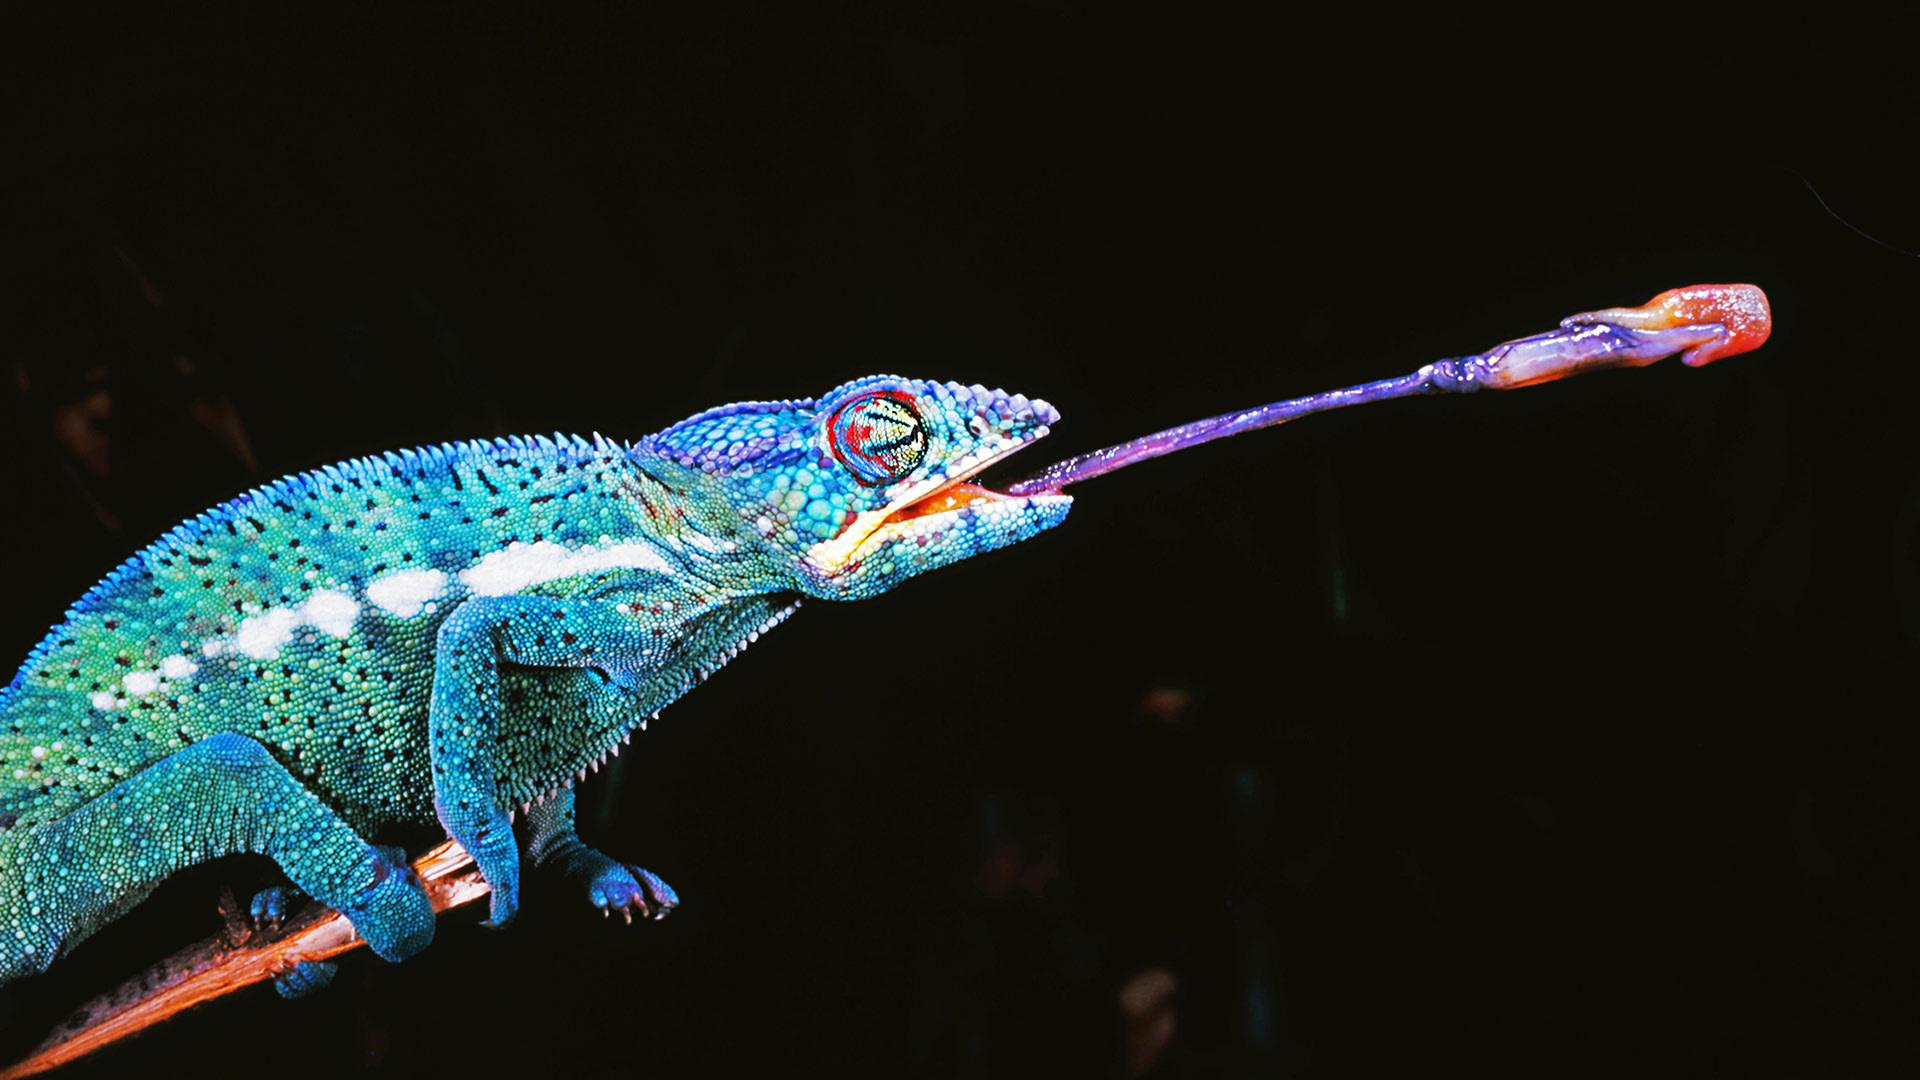 Chameleon catching prey